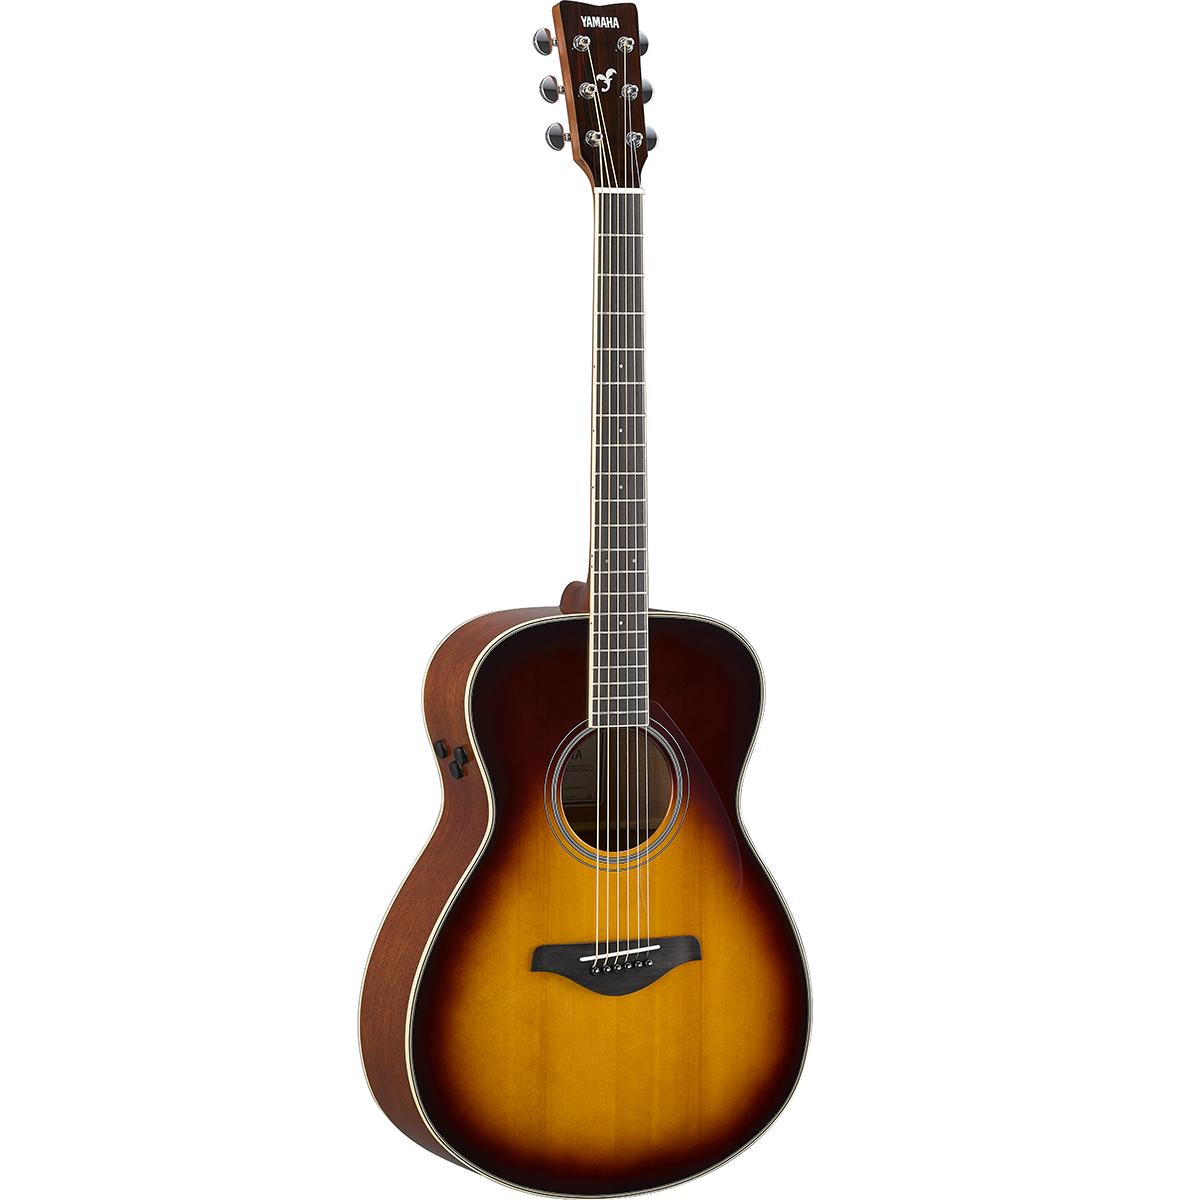 Yamaha - Guitare TransAcoustic FS-TA - Brown Sunburst